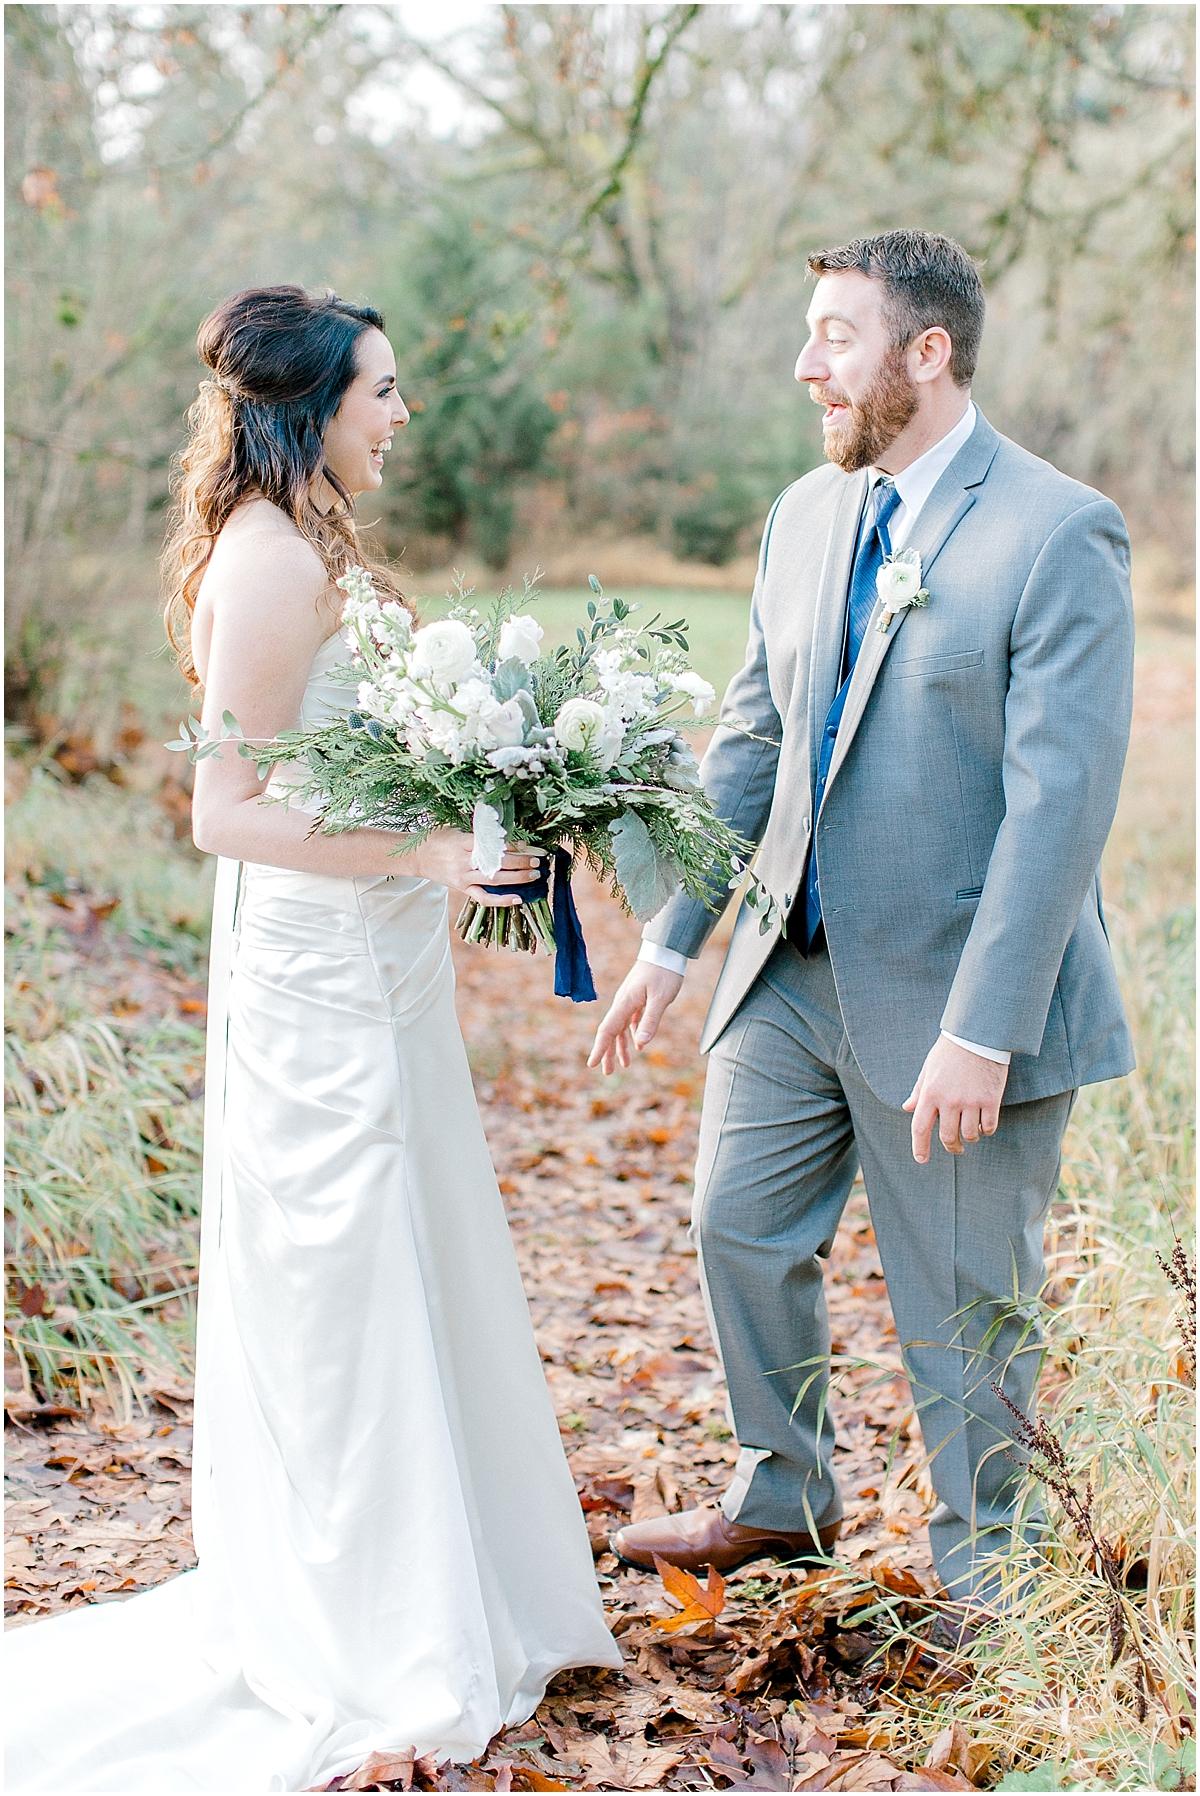 Chehalis Washington Winter Wedding Silver and White | Willapa Hills Farm Wedding | Eastham | Emma Rose Company PNW Light and Airy Wedding Photographer_0020.jpg